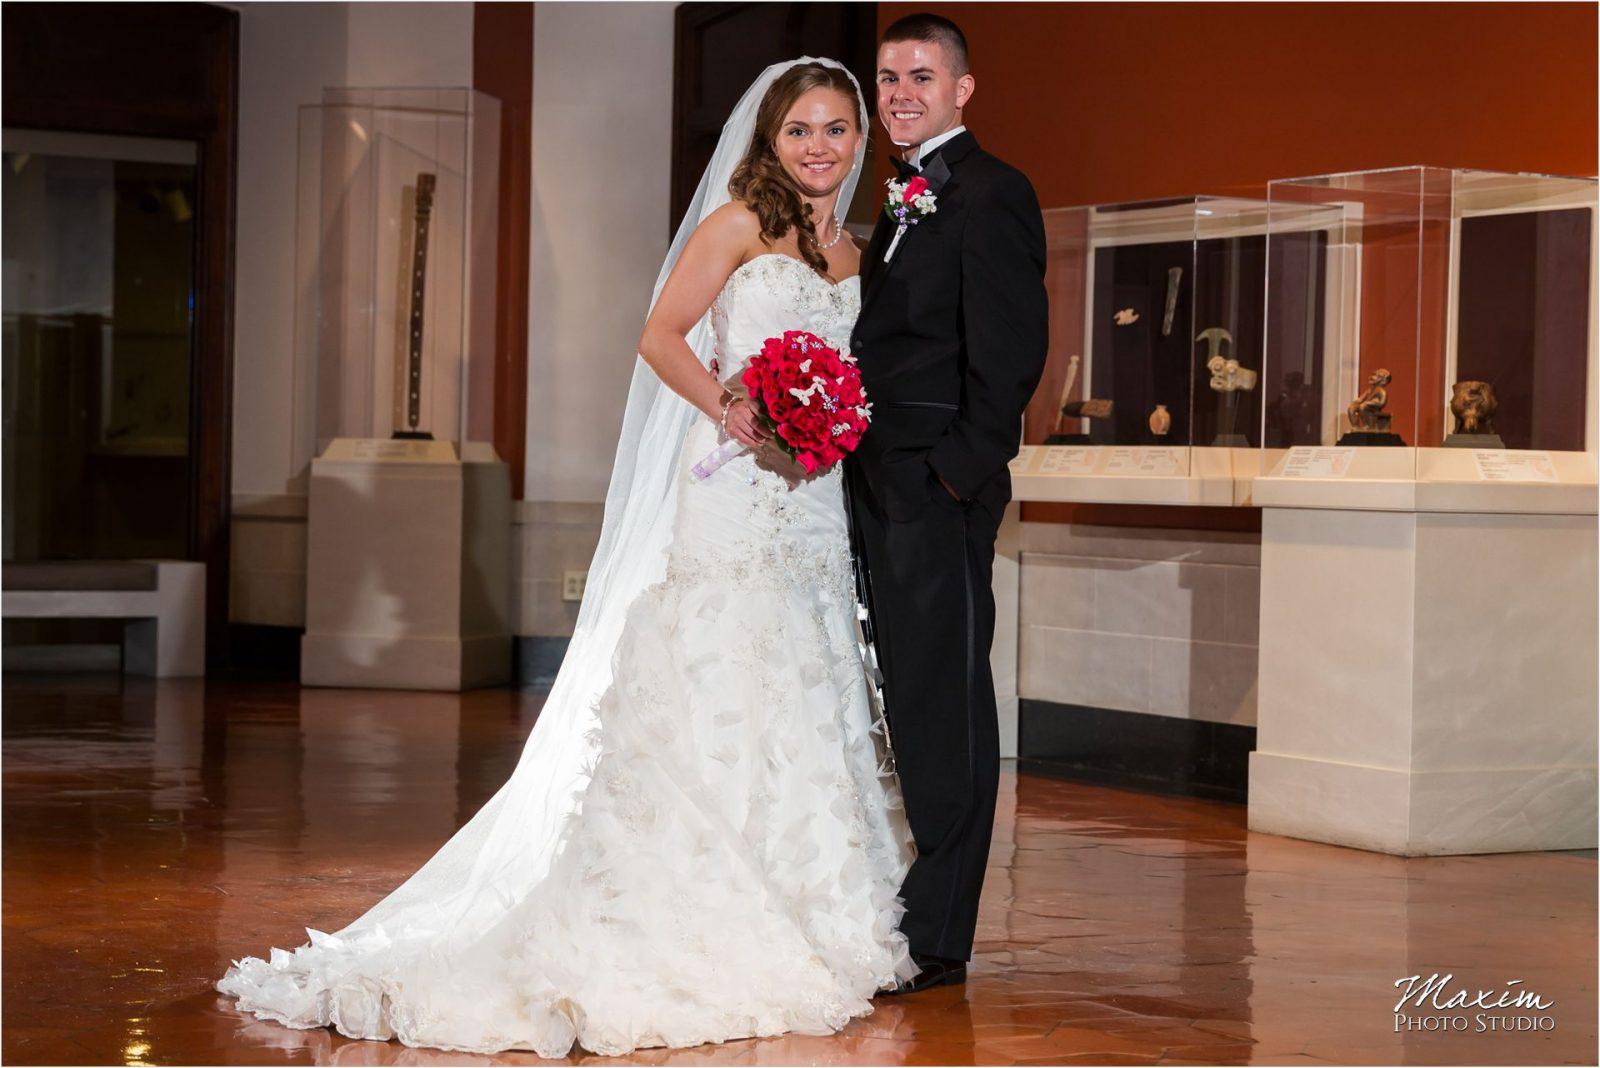 Dayton Art Institute, Dayton Wedding Vendors, Art Institute Bride